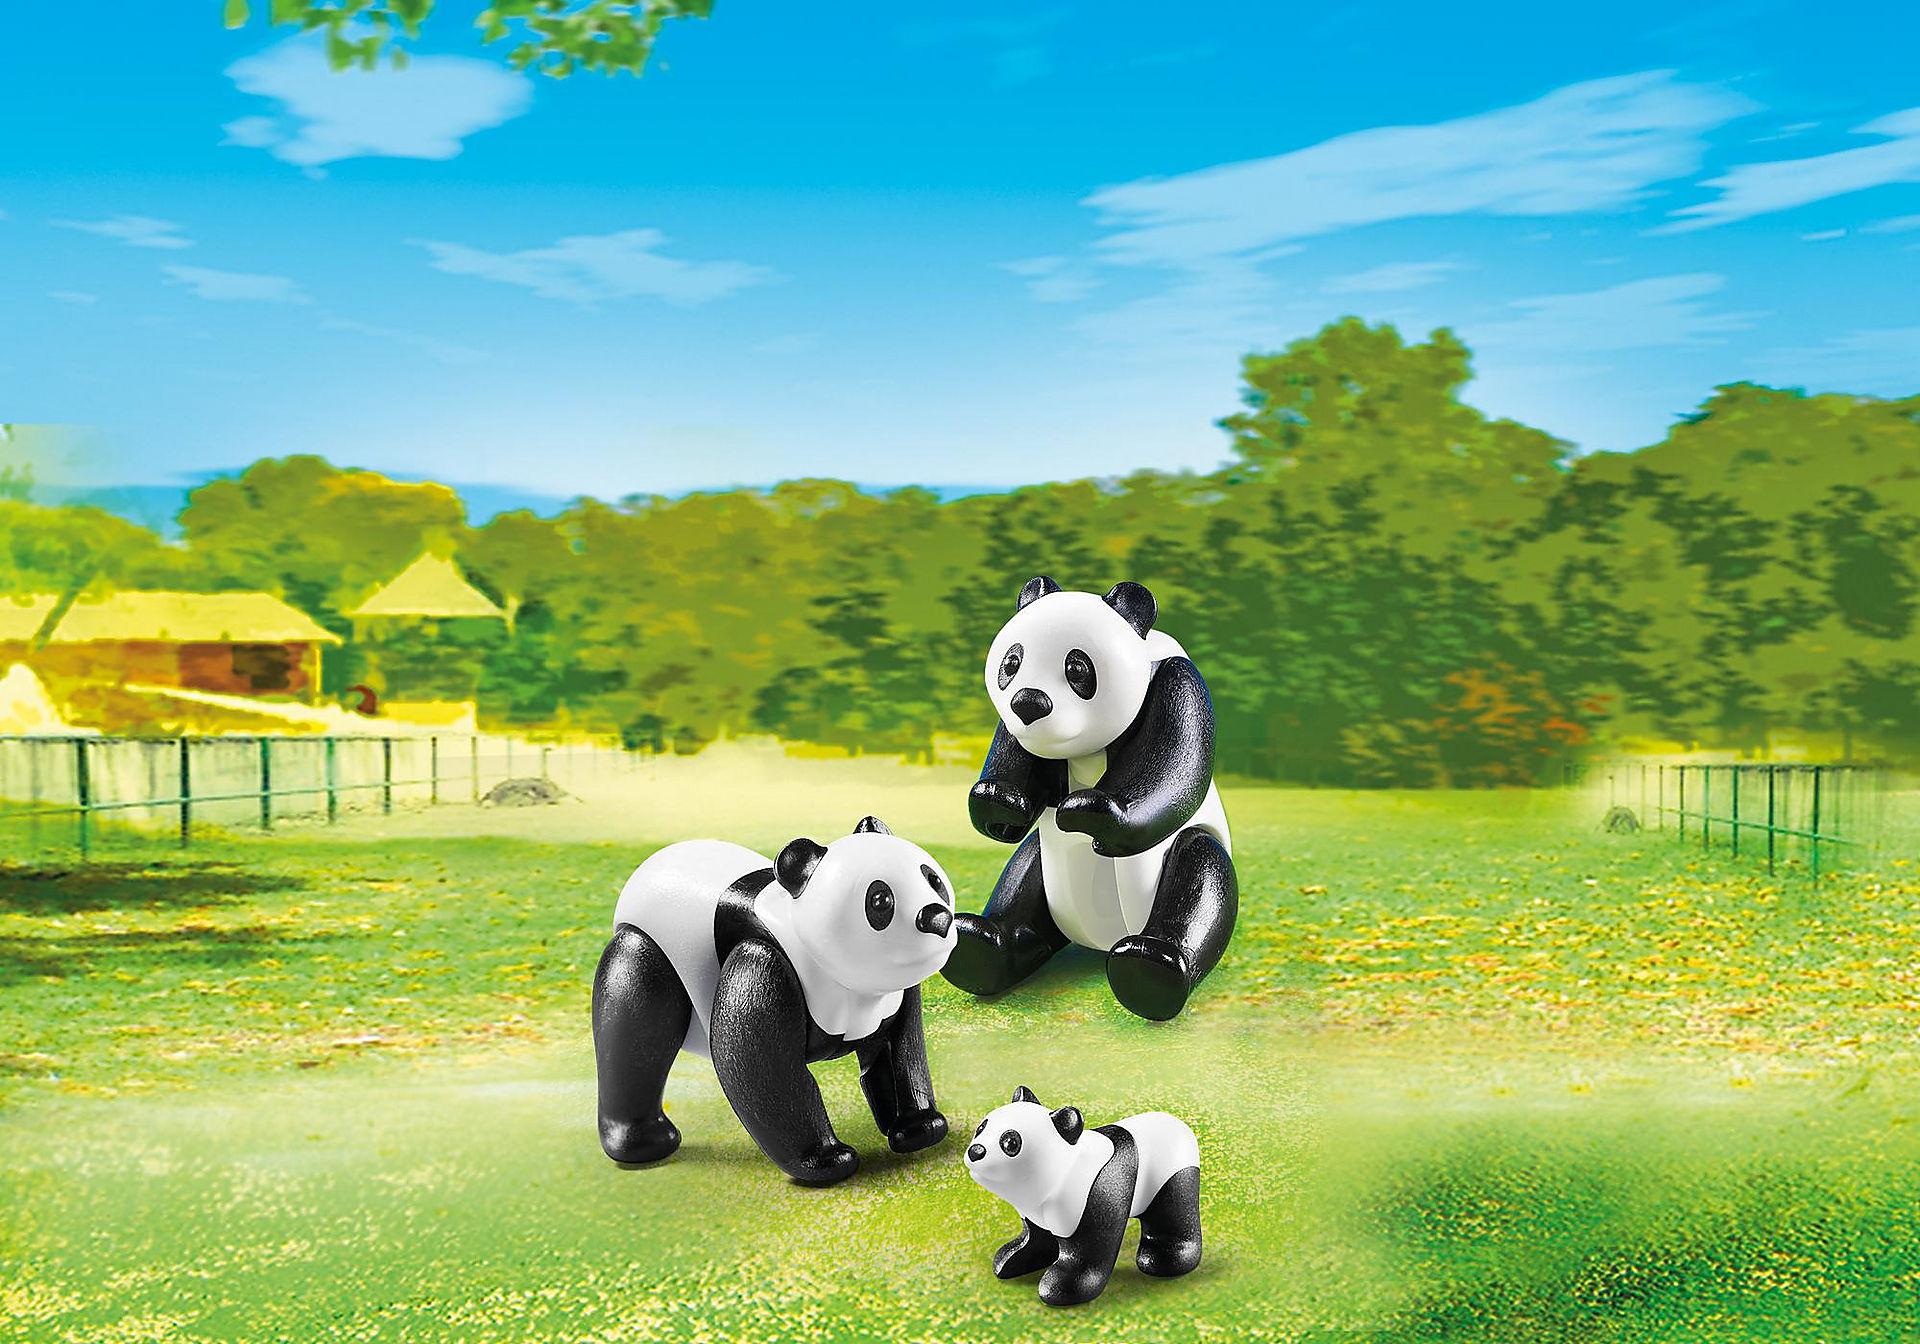 6652 Panda Family zoom image1